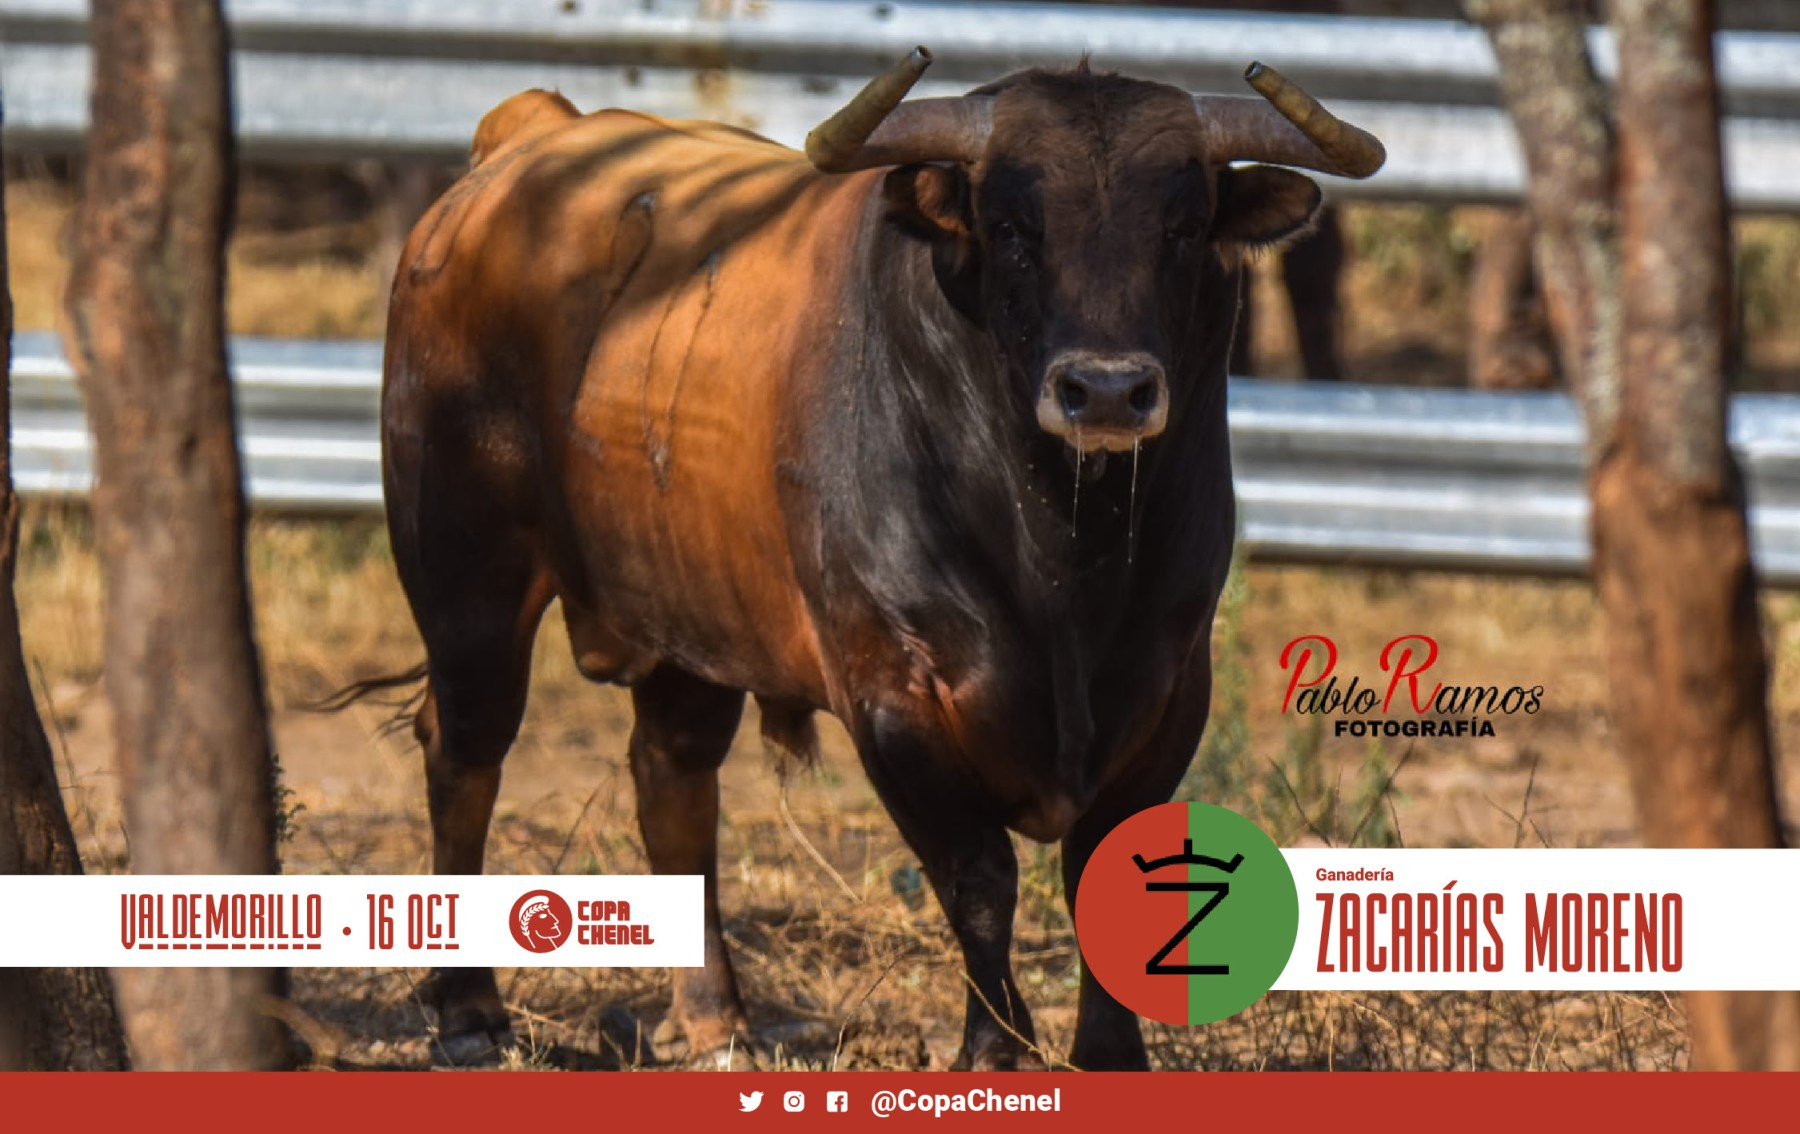 ZACARIAS-MORENO-2